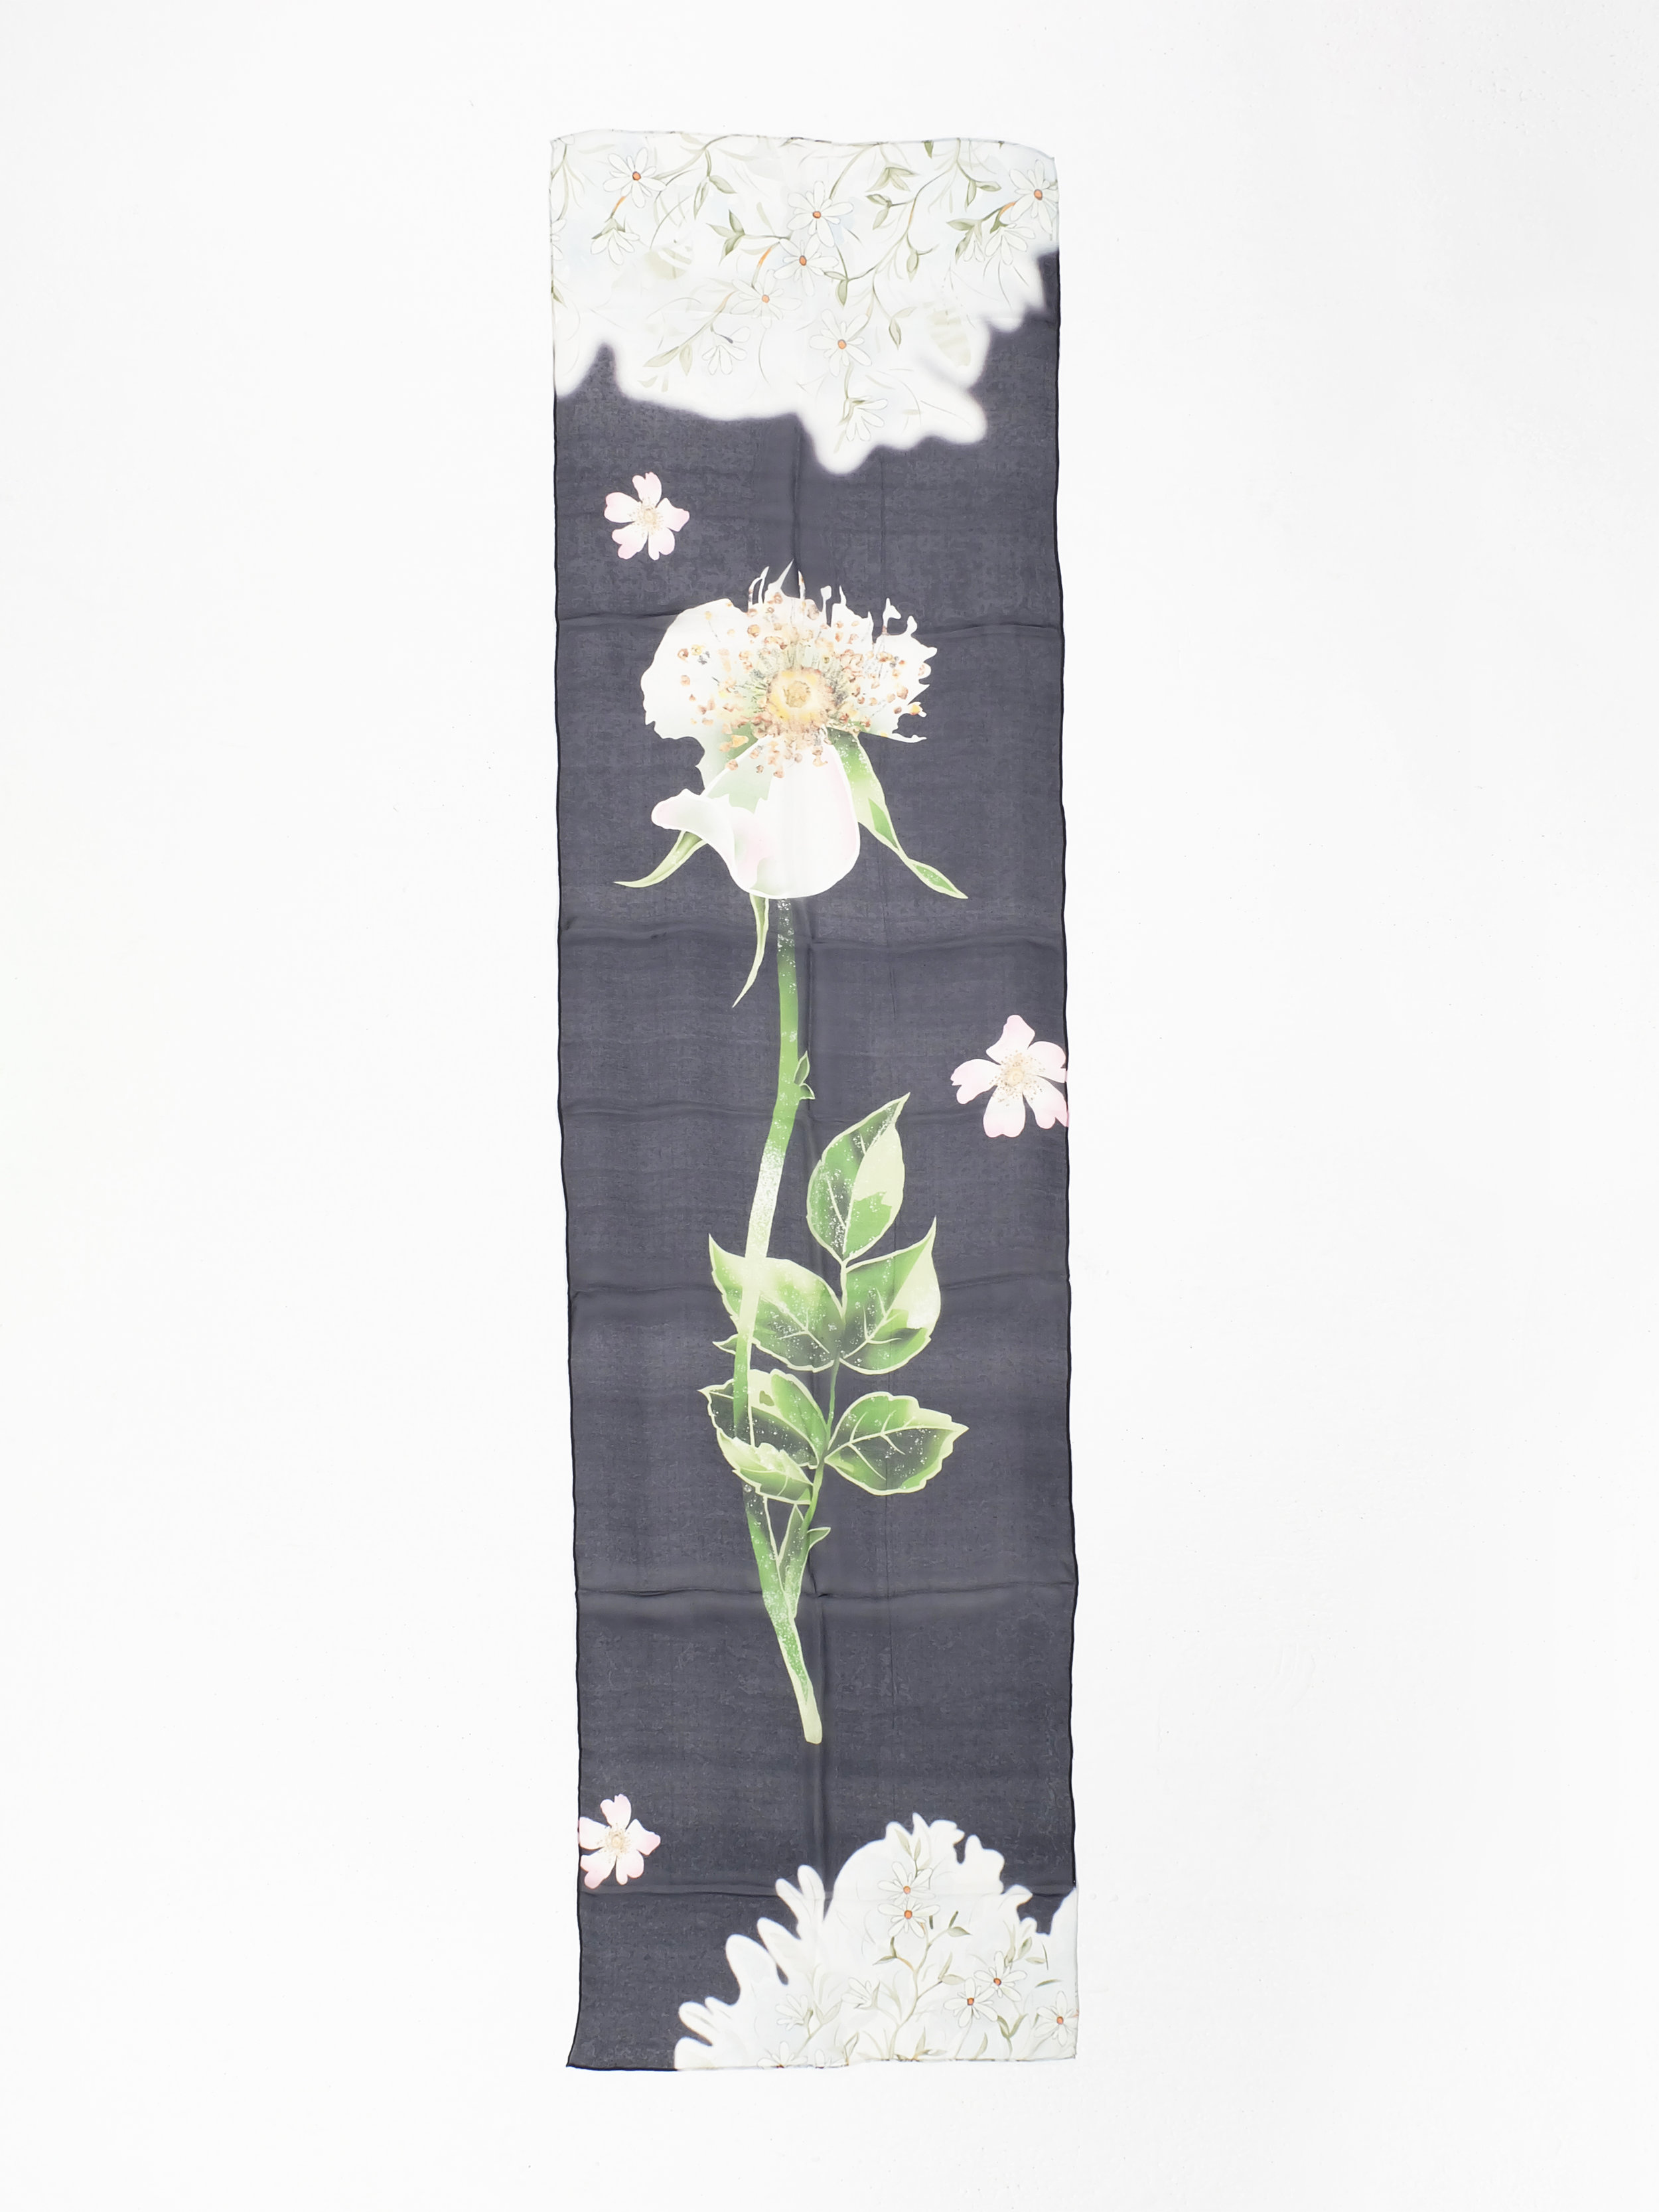 First Blooms (Black) - 182x40cm